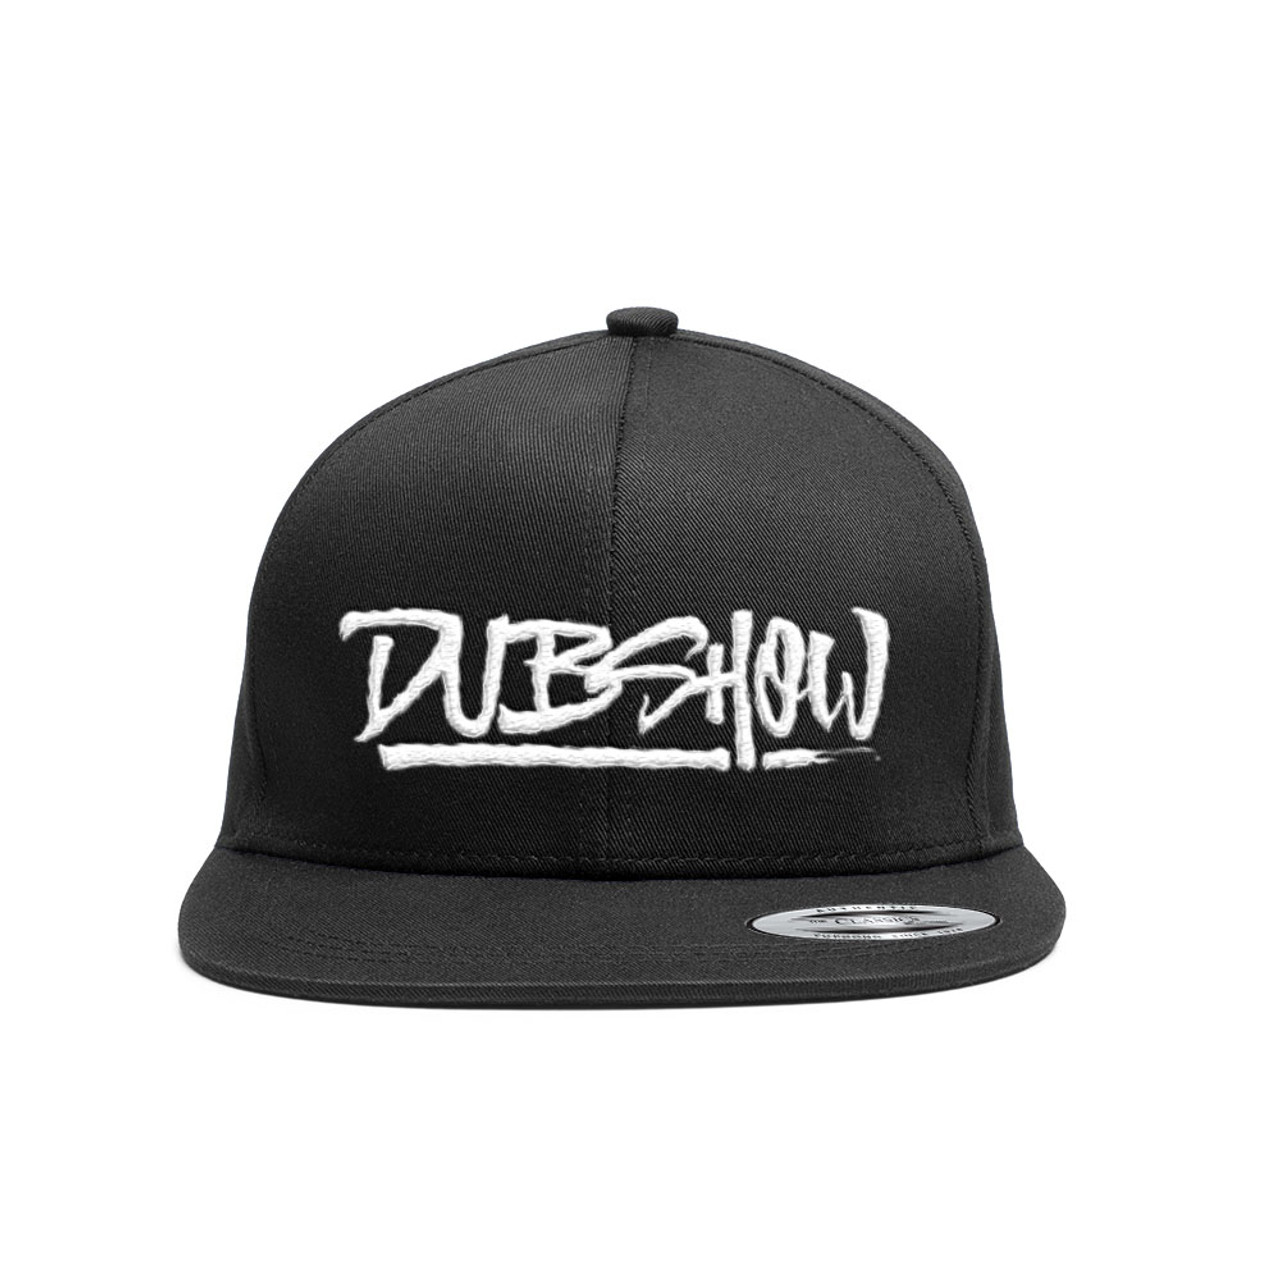 DUB Show Script Snapback Cap - White - DUB Shop 05b9af8de9c3